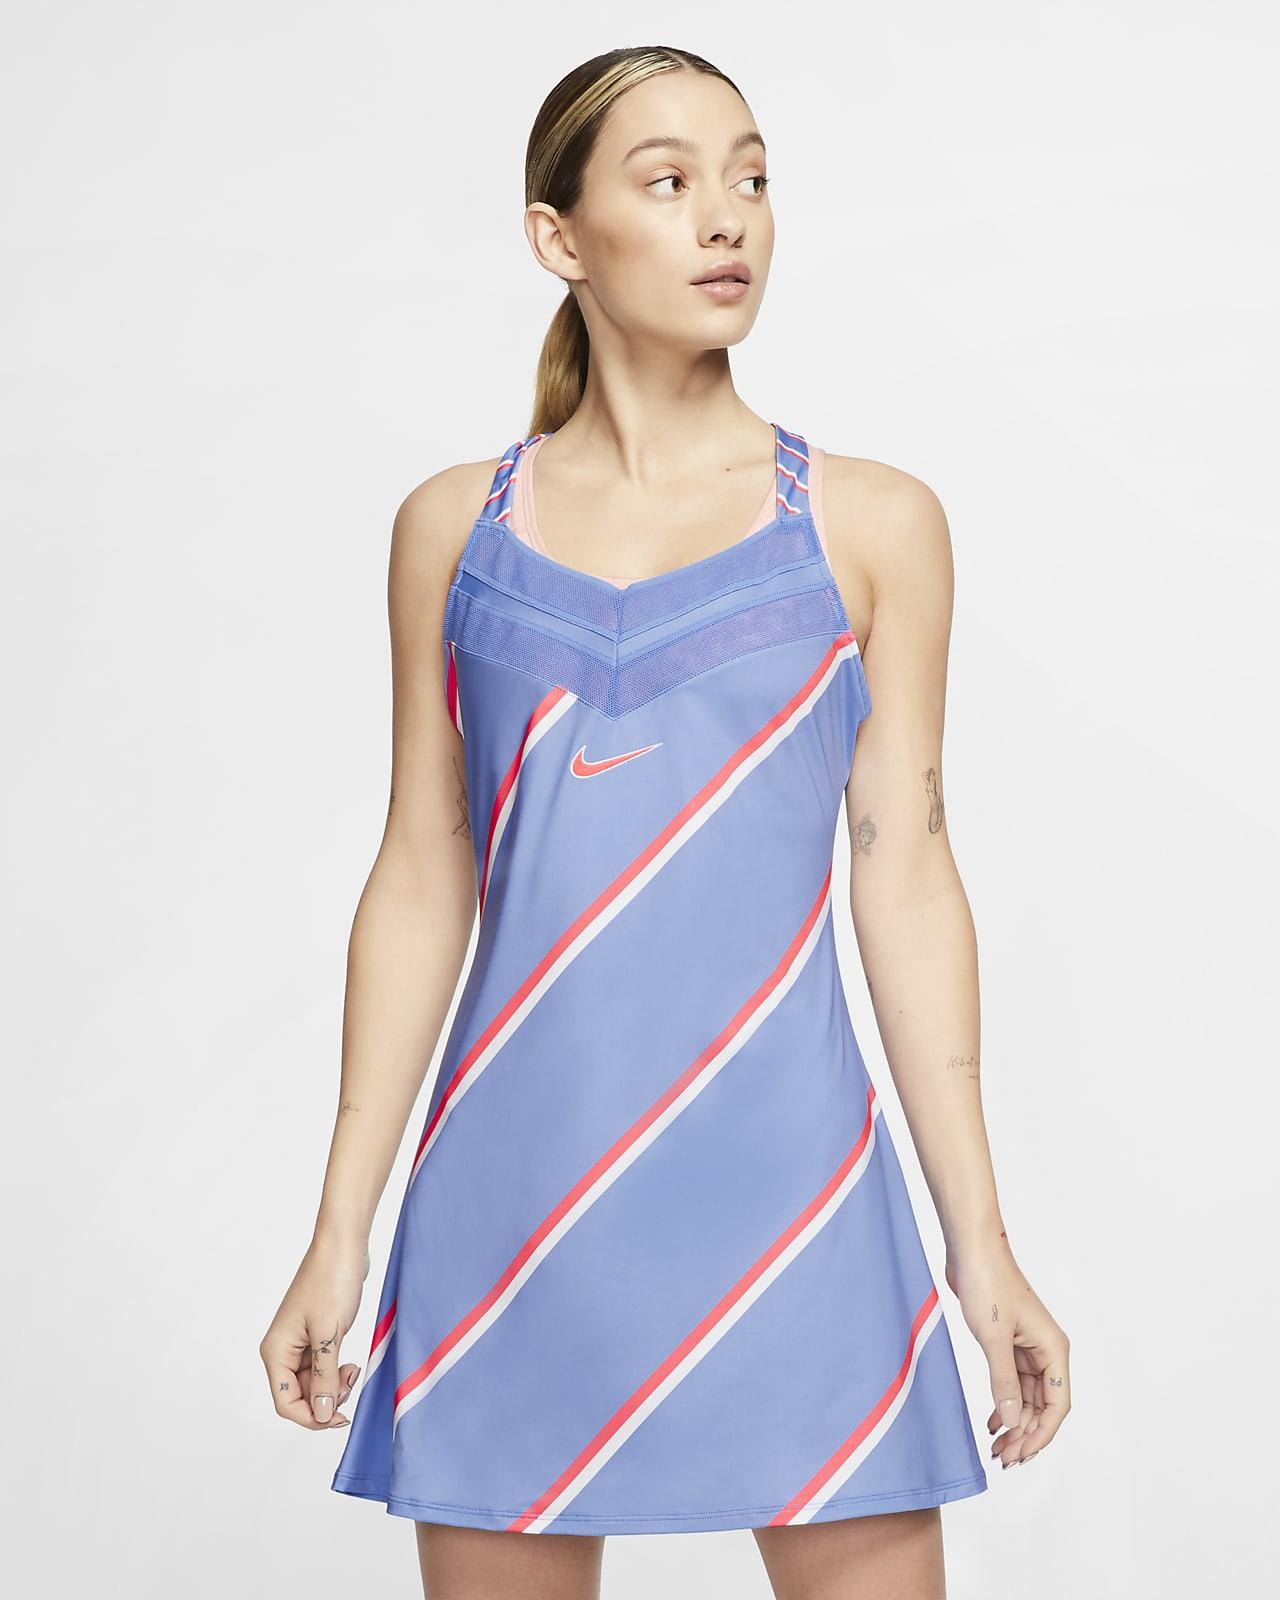 Nikecourt Women S Tennis Dress Nike At